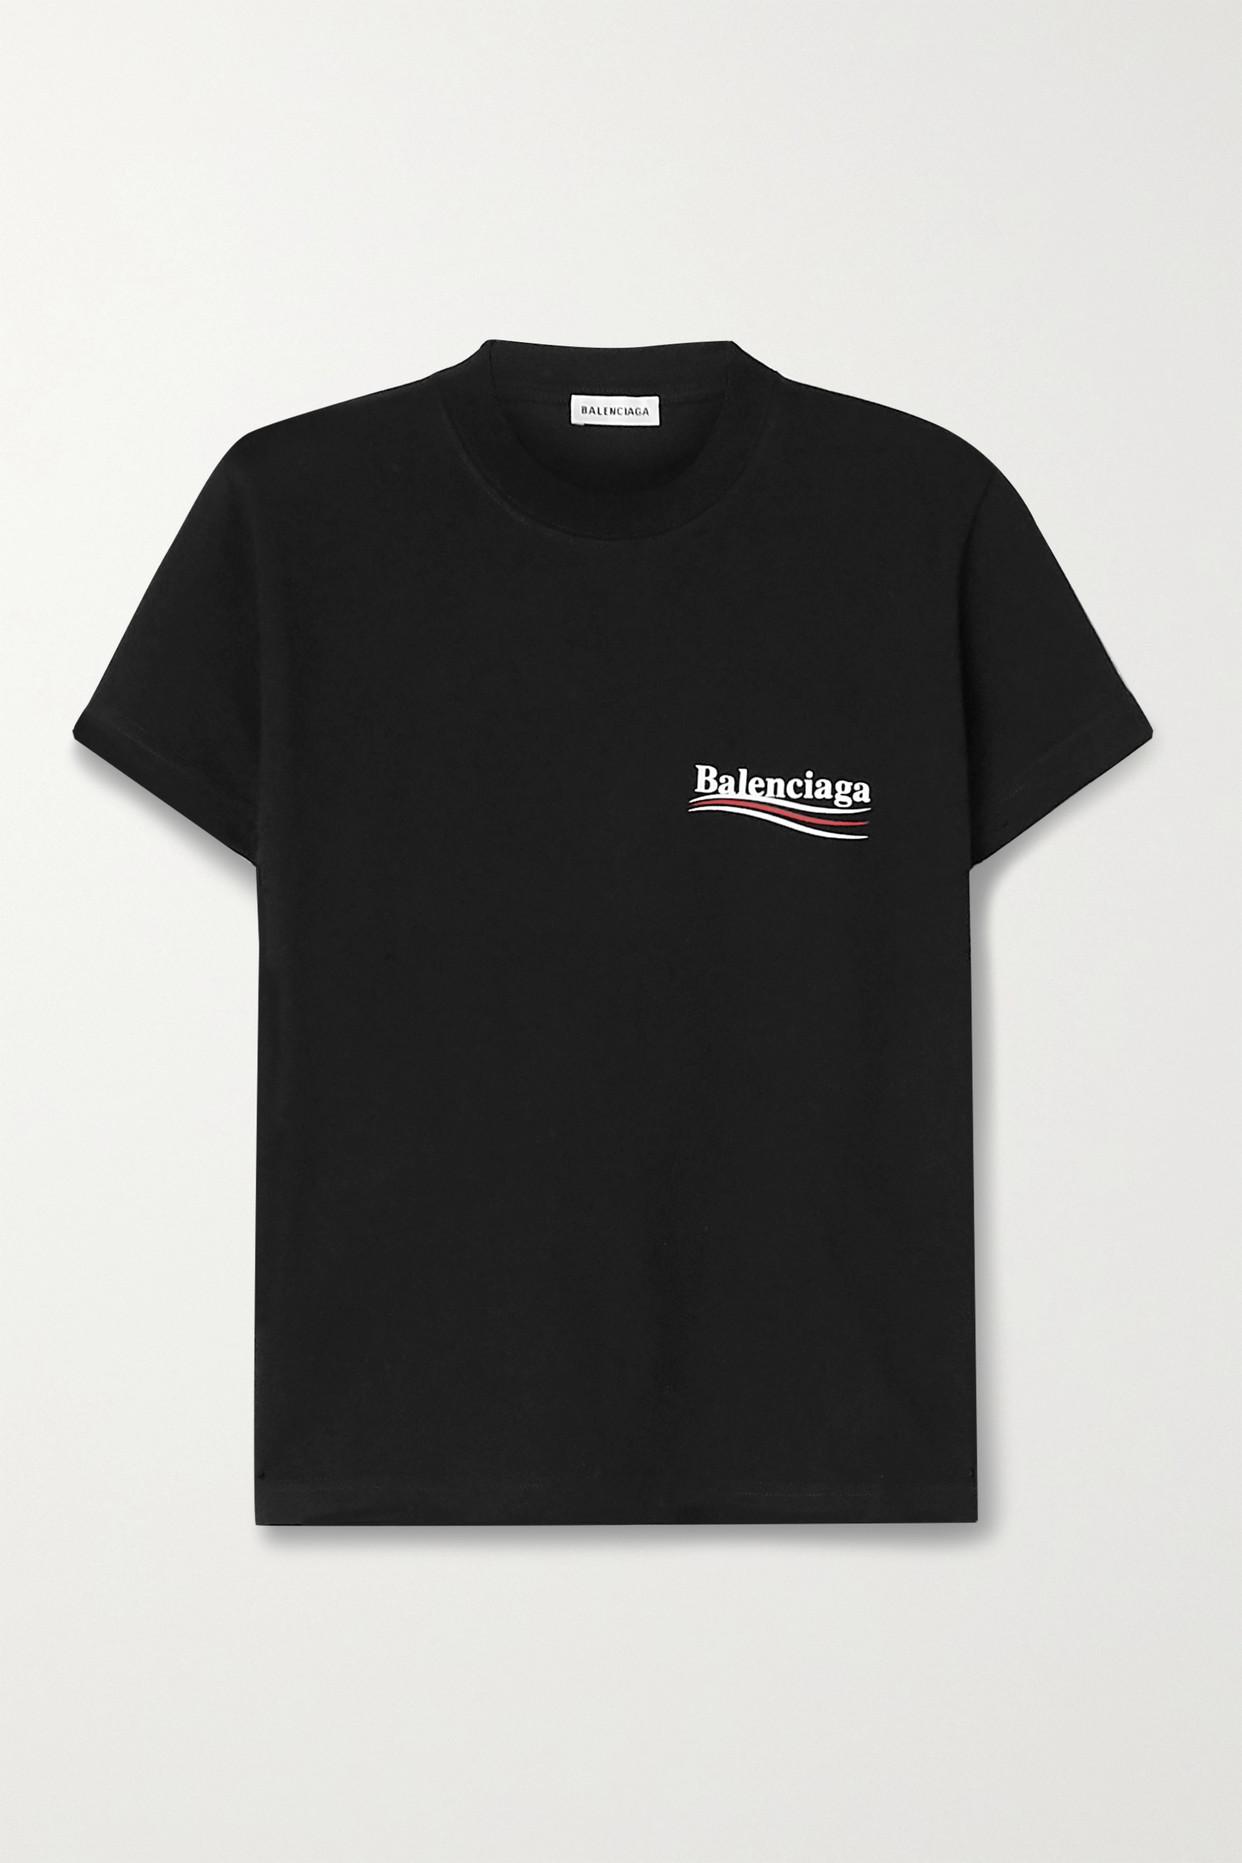 BALENCIAGA - Printed Cotton-jersey T-shirt - Black - small